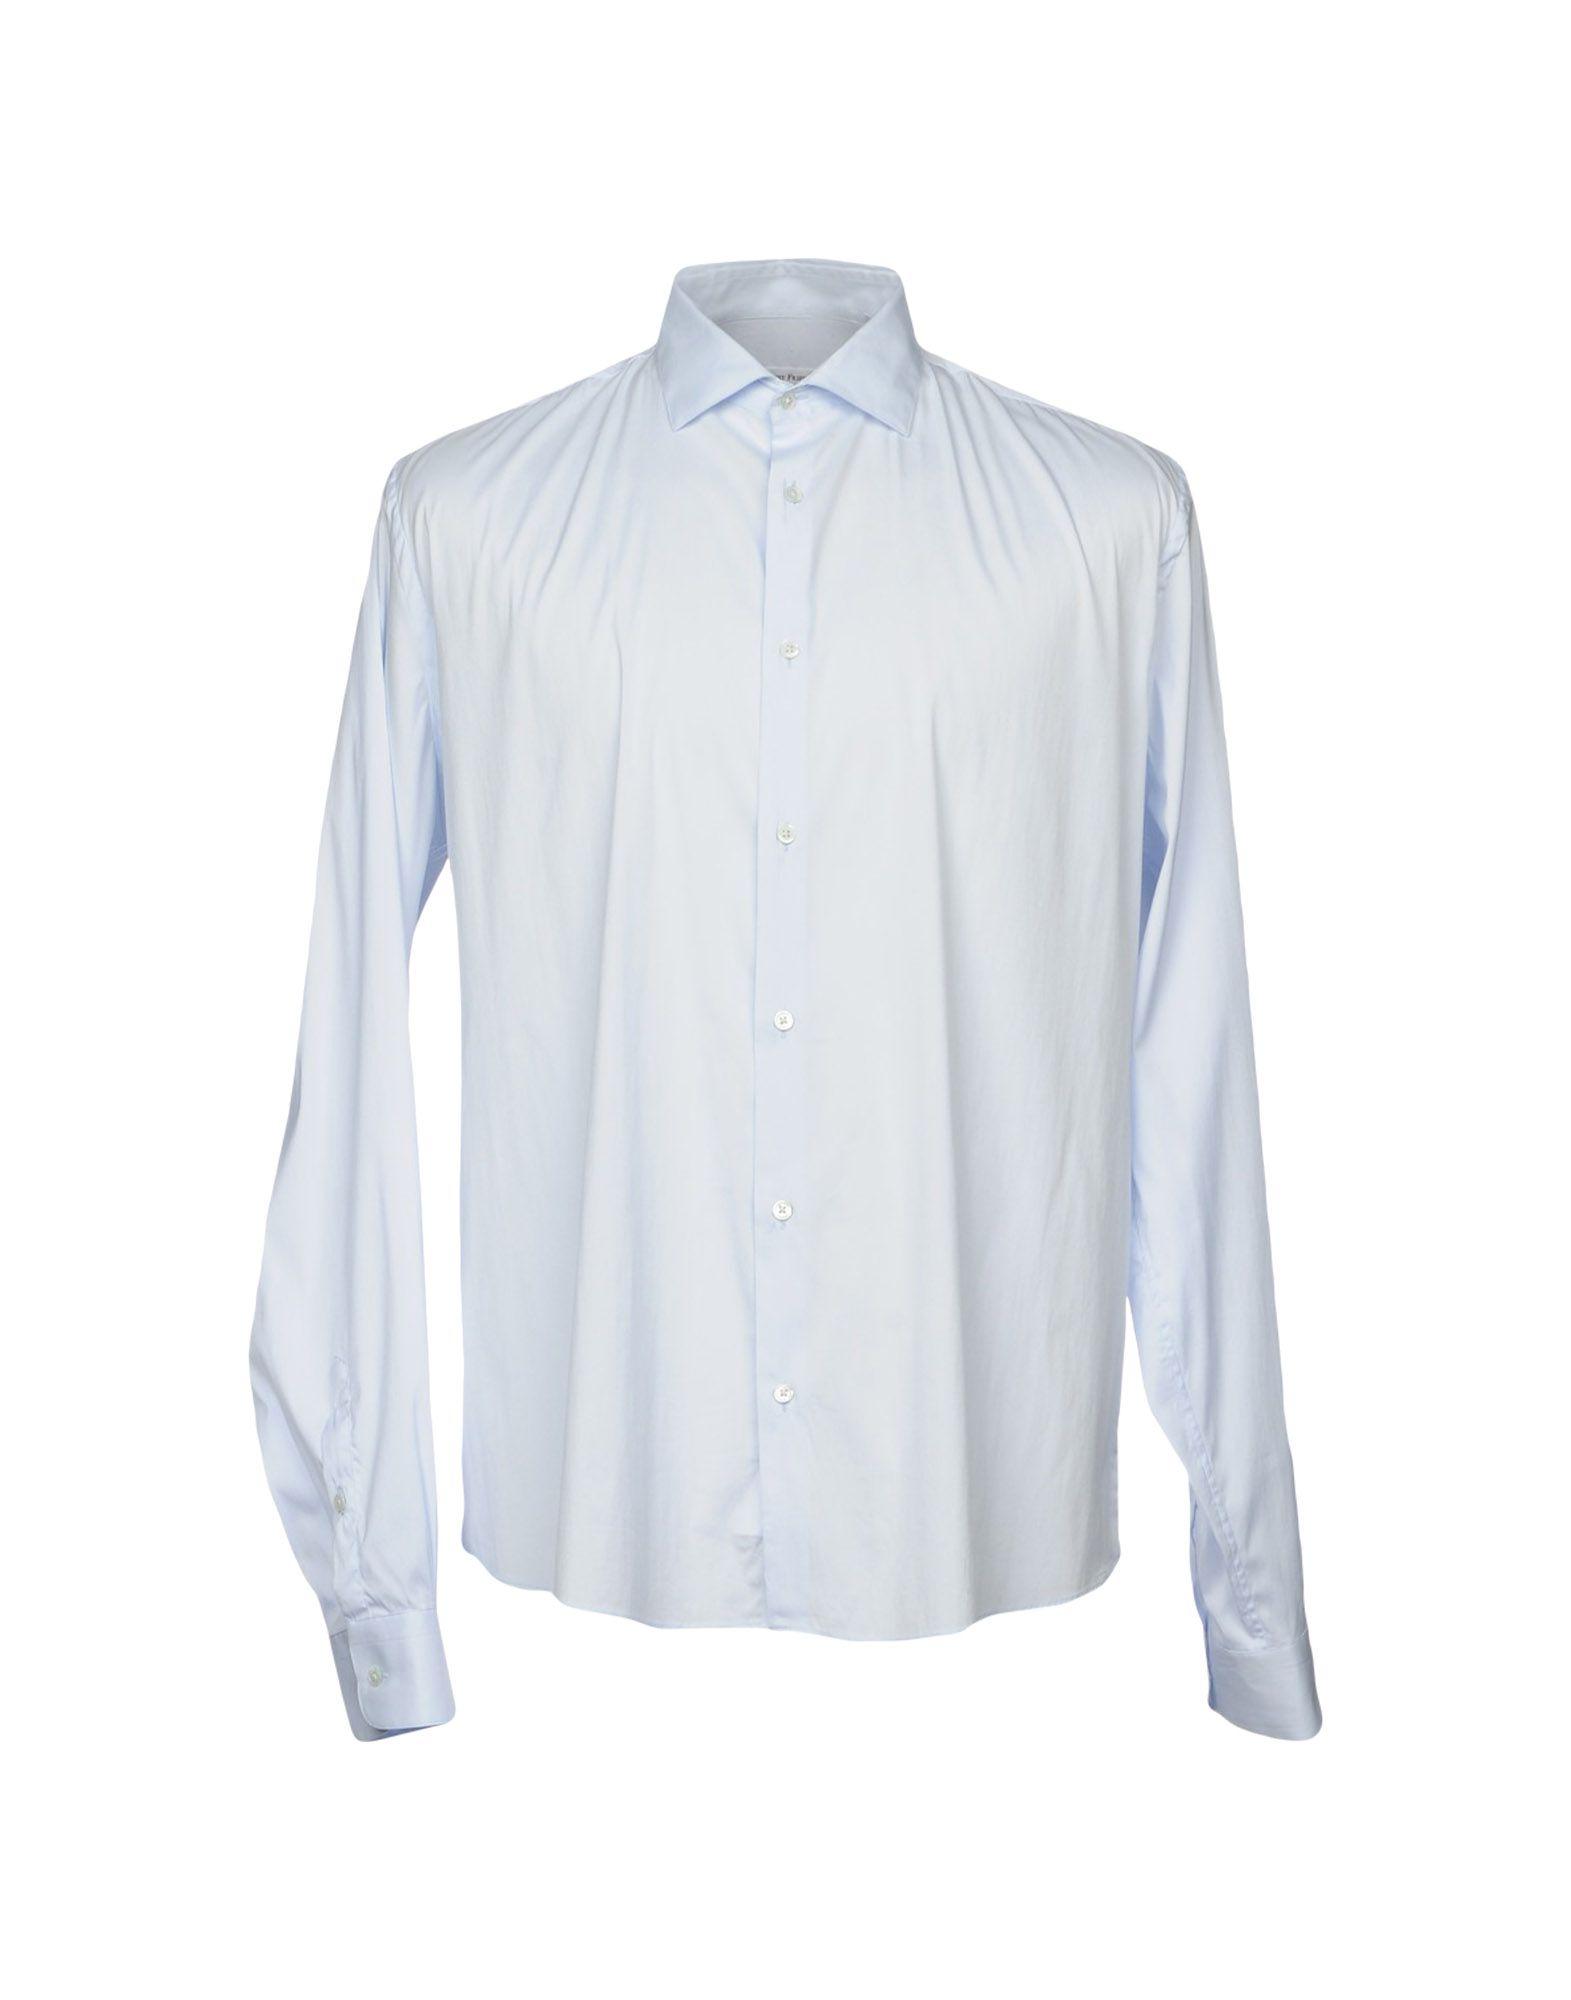 ROBERT FRIEDMAN Solid Color Shirt in Sky Blue